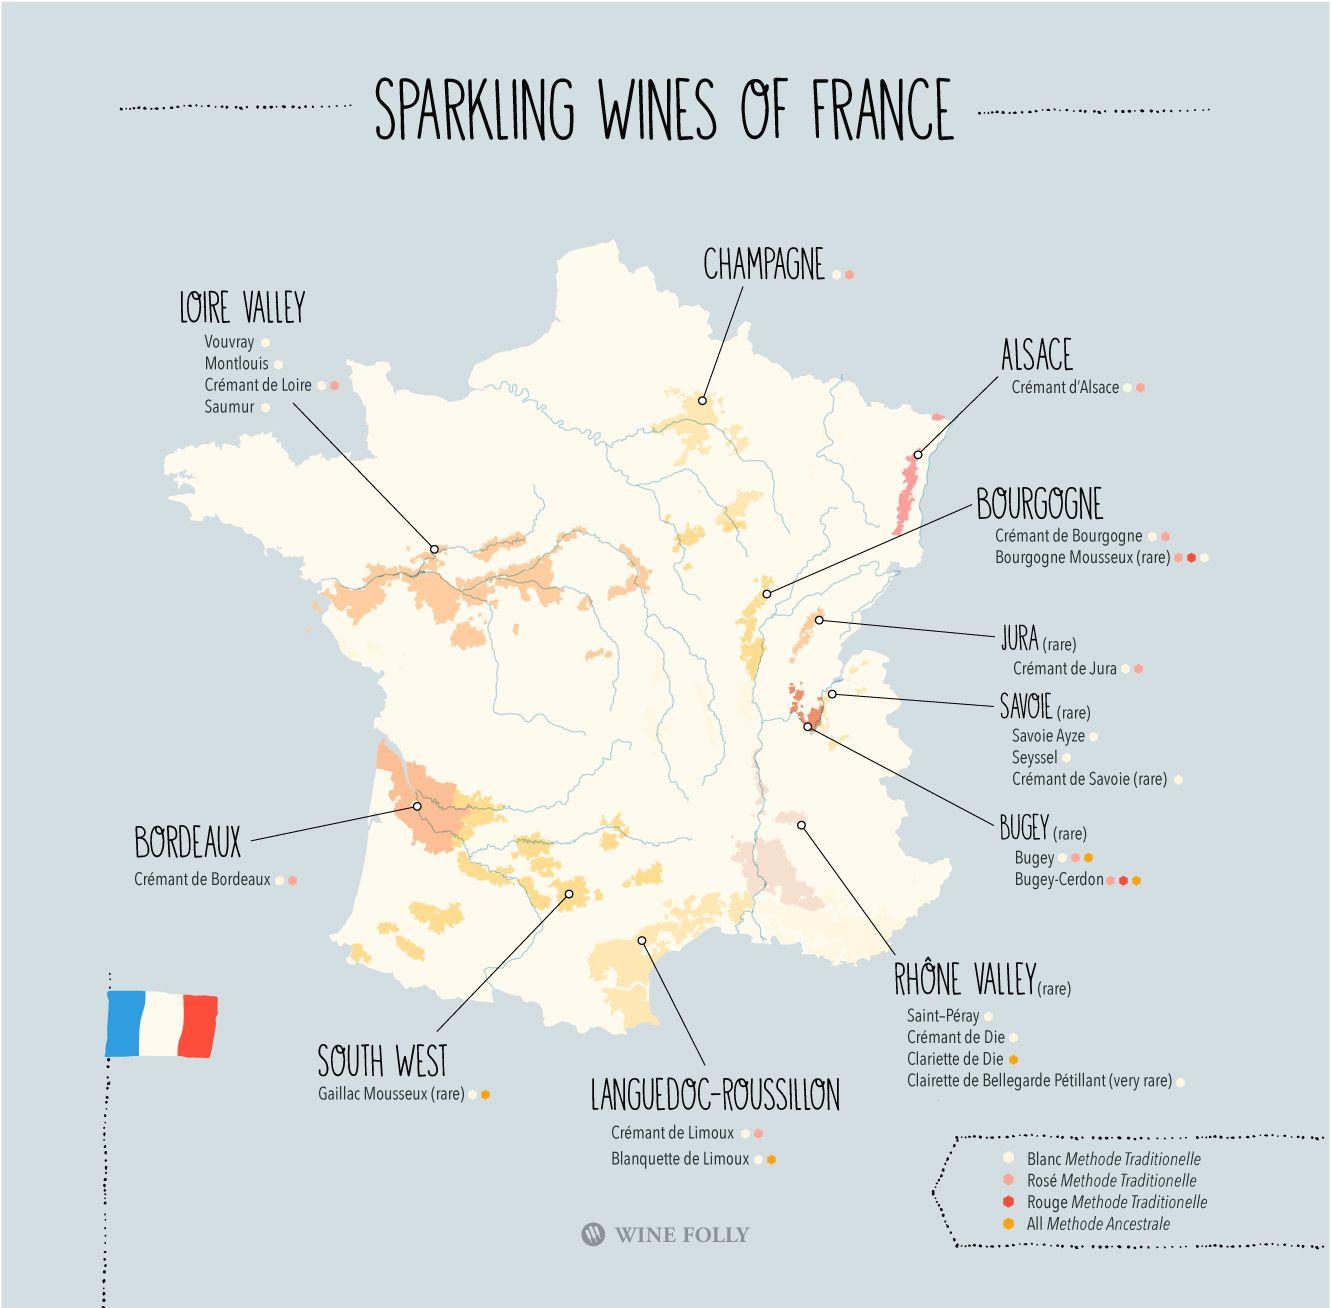 Beyond Champagne 23 Sparkling Wines Of France In Vino Veritas